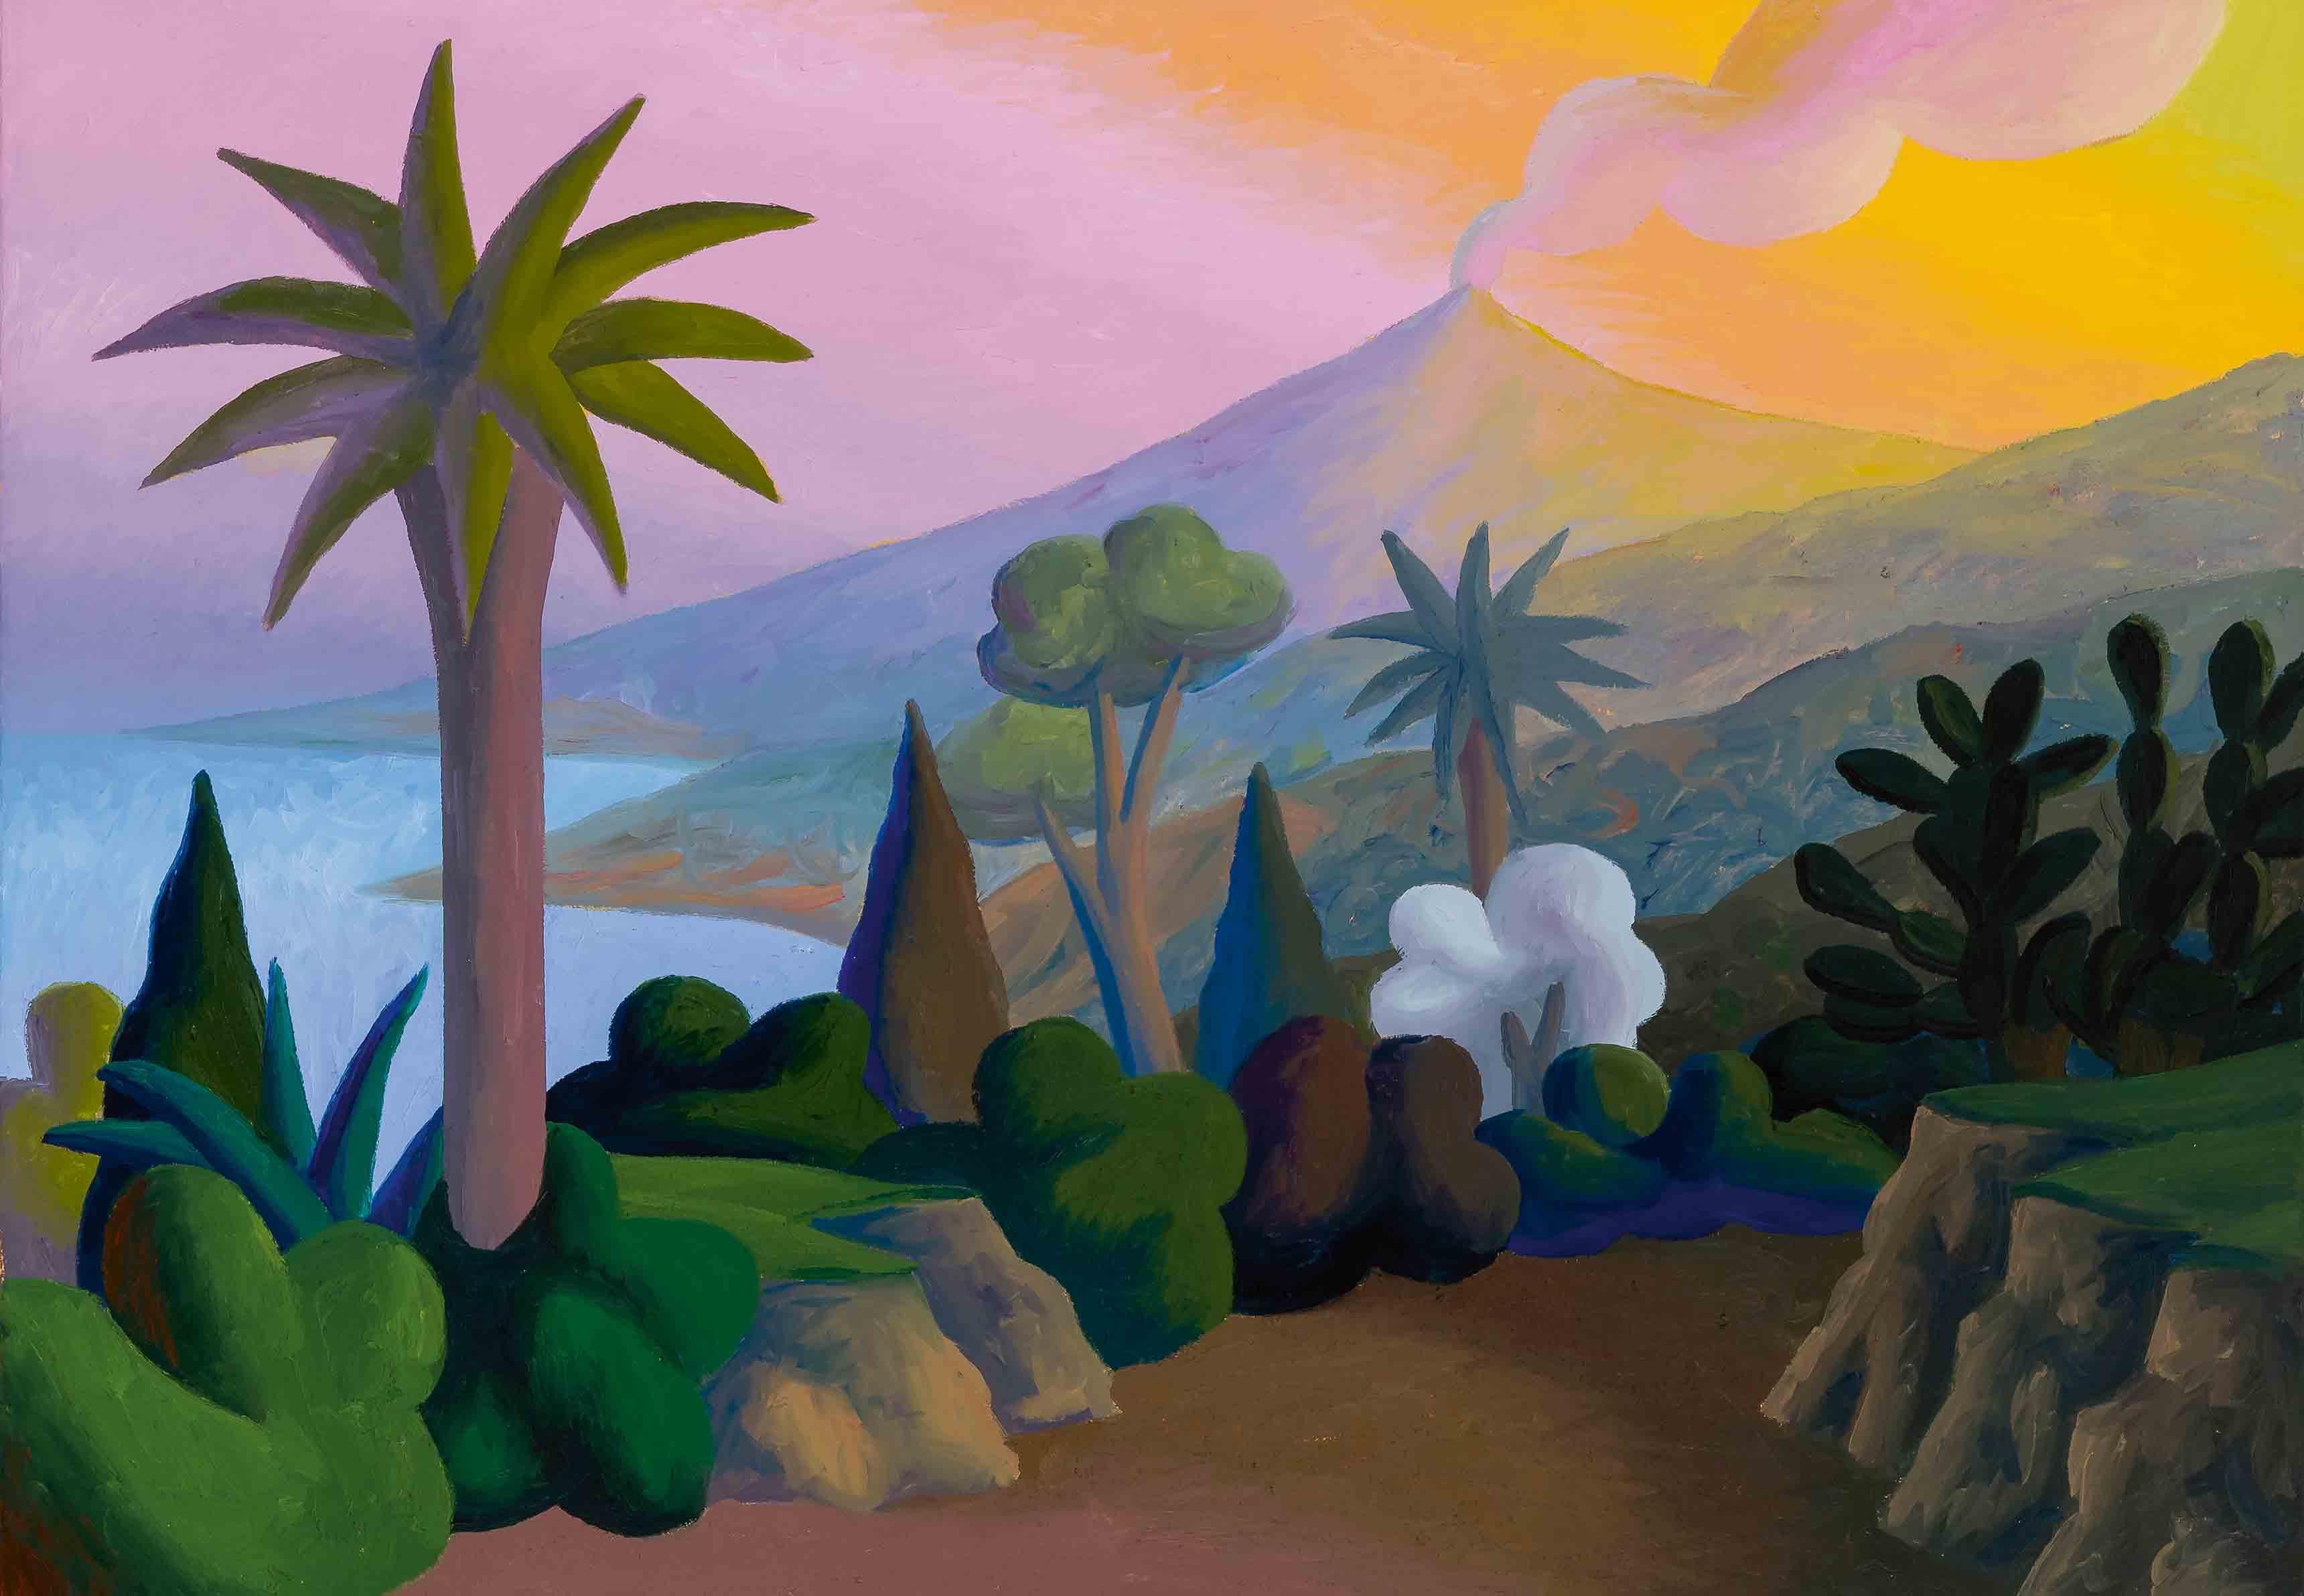 """L'Etna Da Taormina"" (1999), de Salvo, huile sur toile, 70 x 100cm. Collection privée."